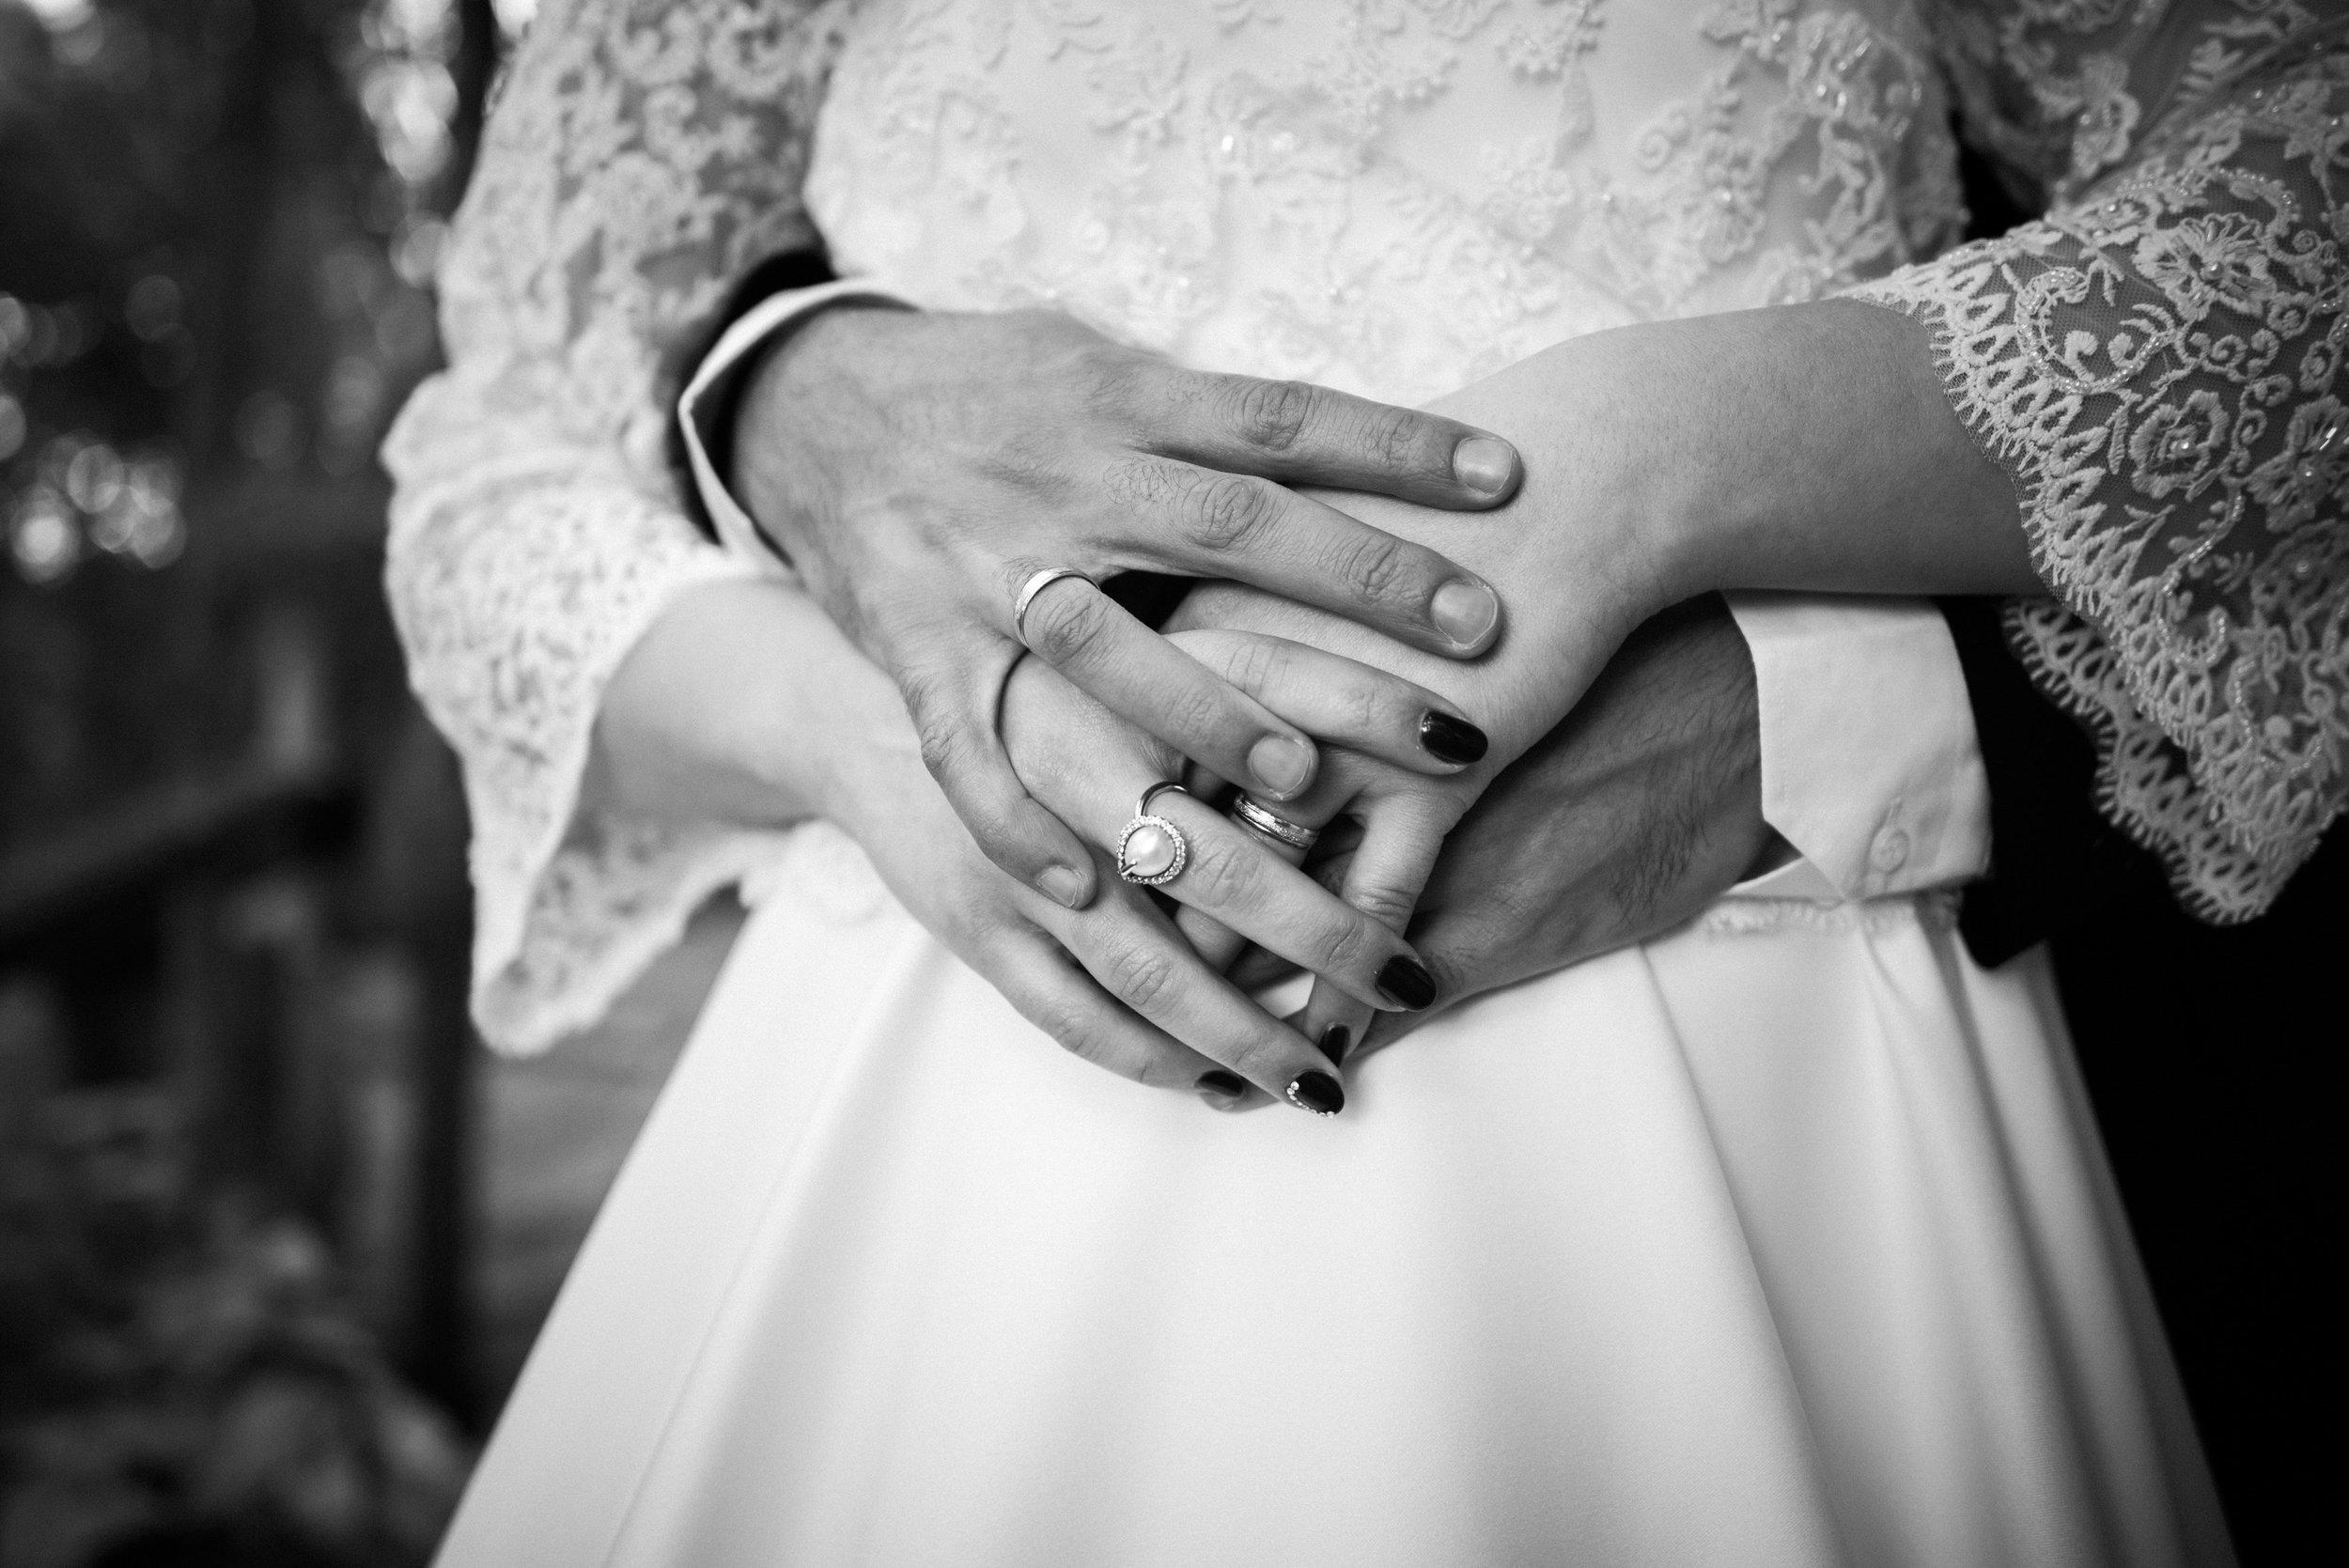 israel-garden-wedding-portraits-session-kate-giryes-photography--20_WEB.jpg